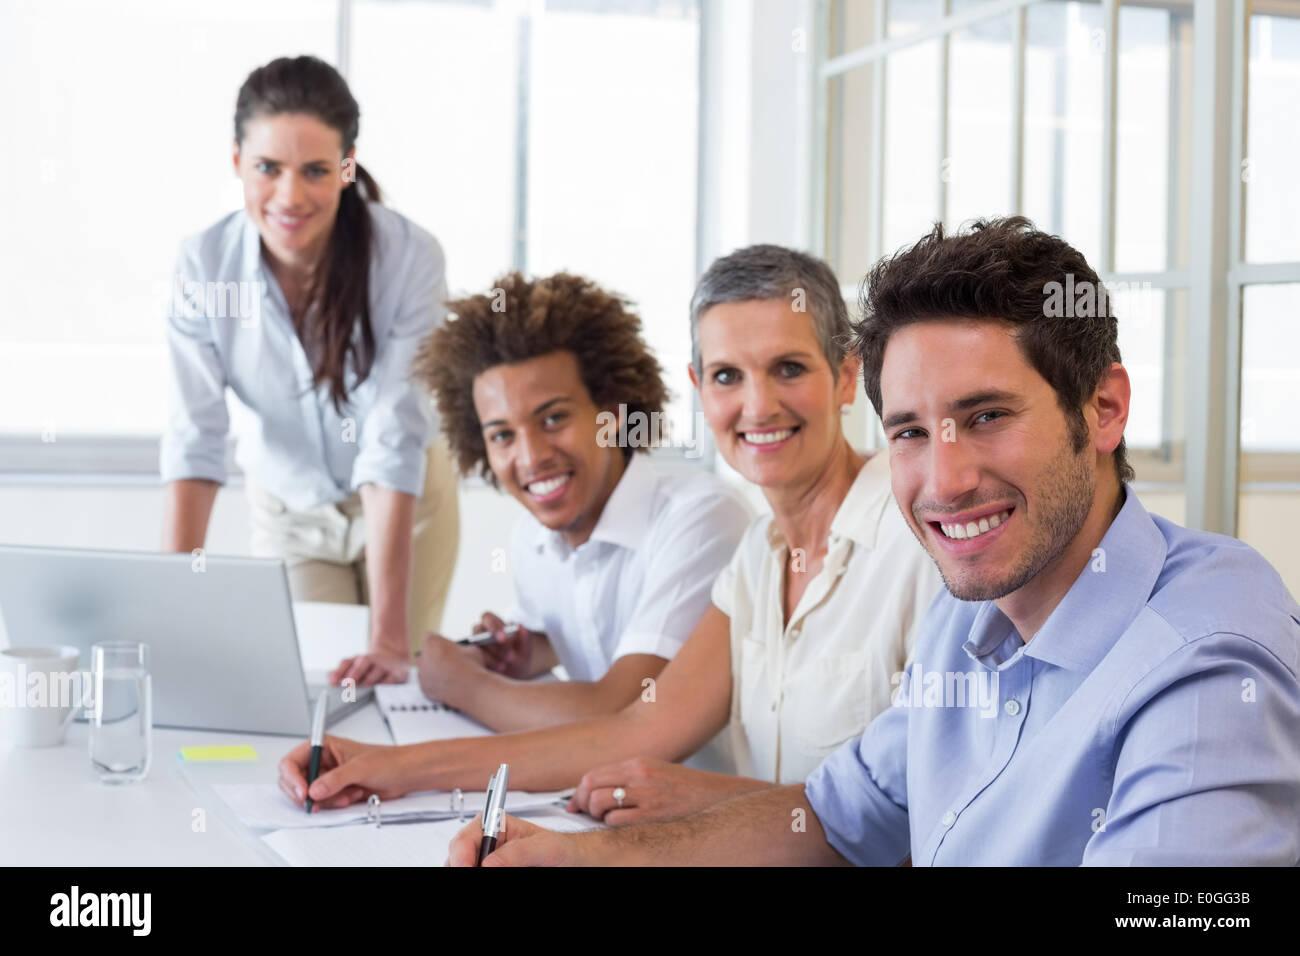 Casual staff smiling at camera - Stock Image